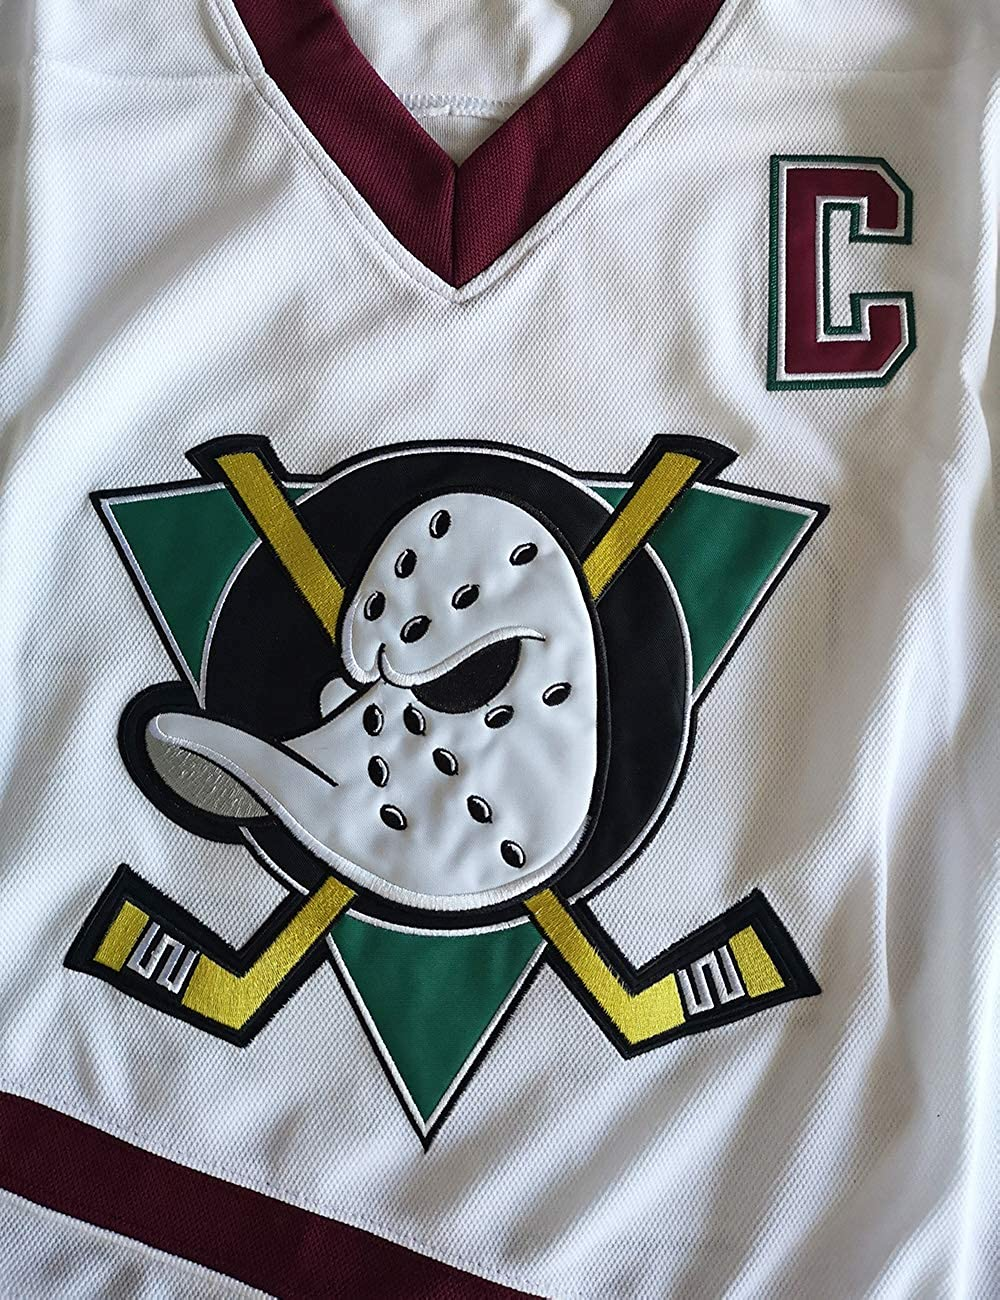 Charlie Conway Mighty Ducks Jersey 96 Movie Ice Hockey Jerseys Stitched White S-XXXL